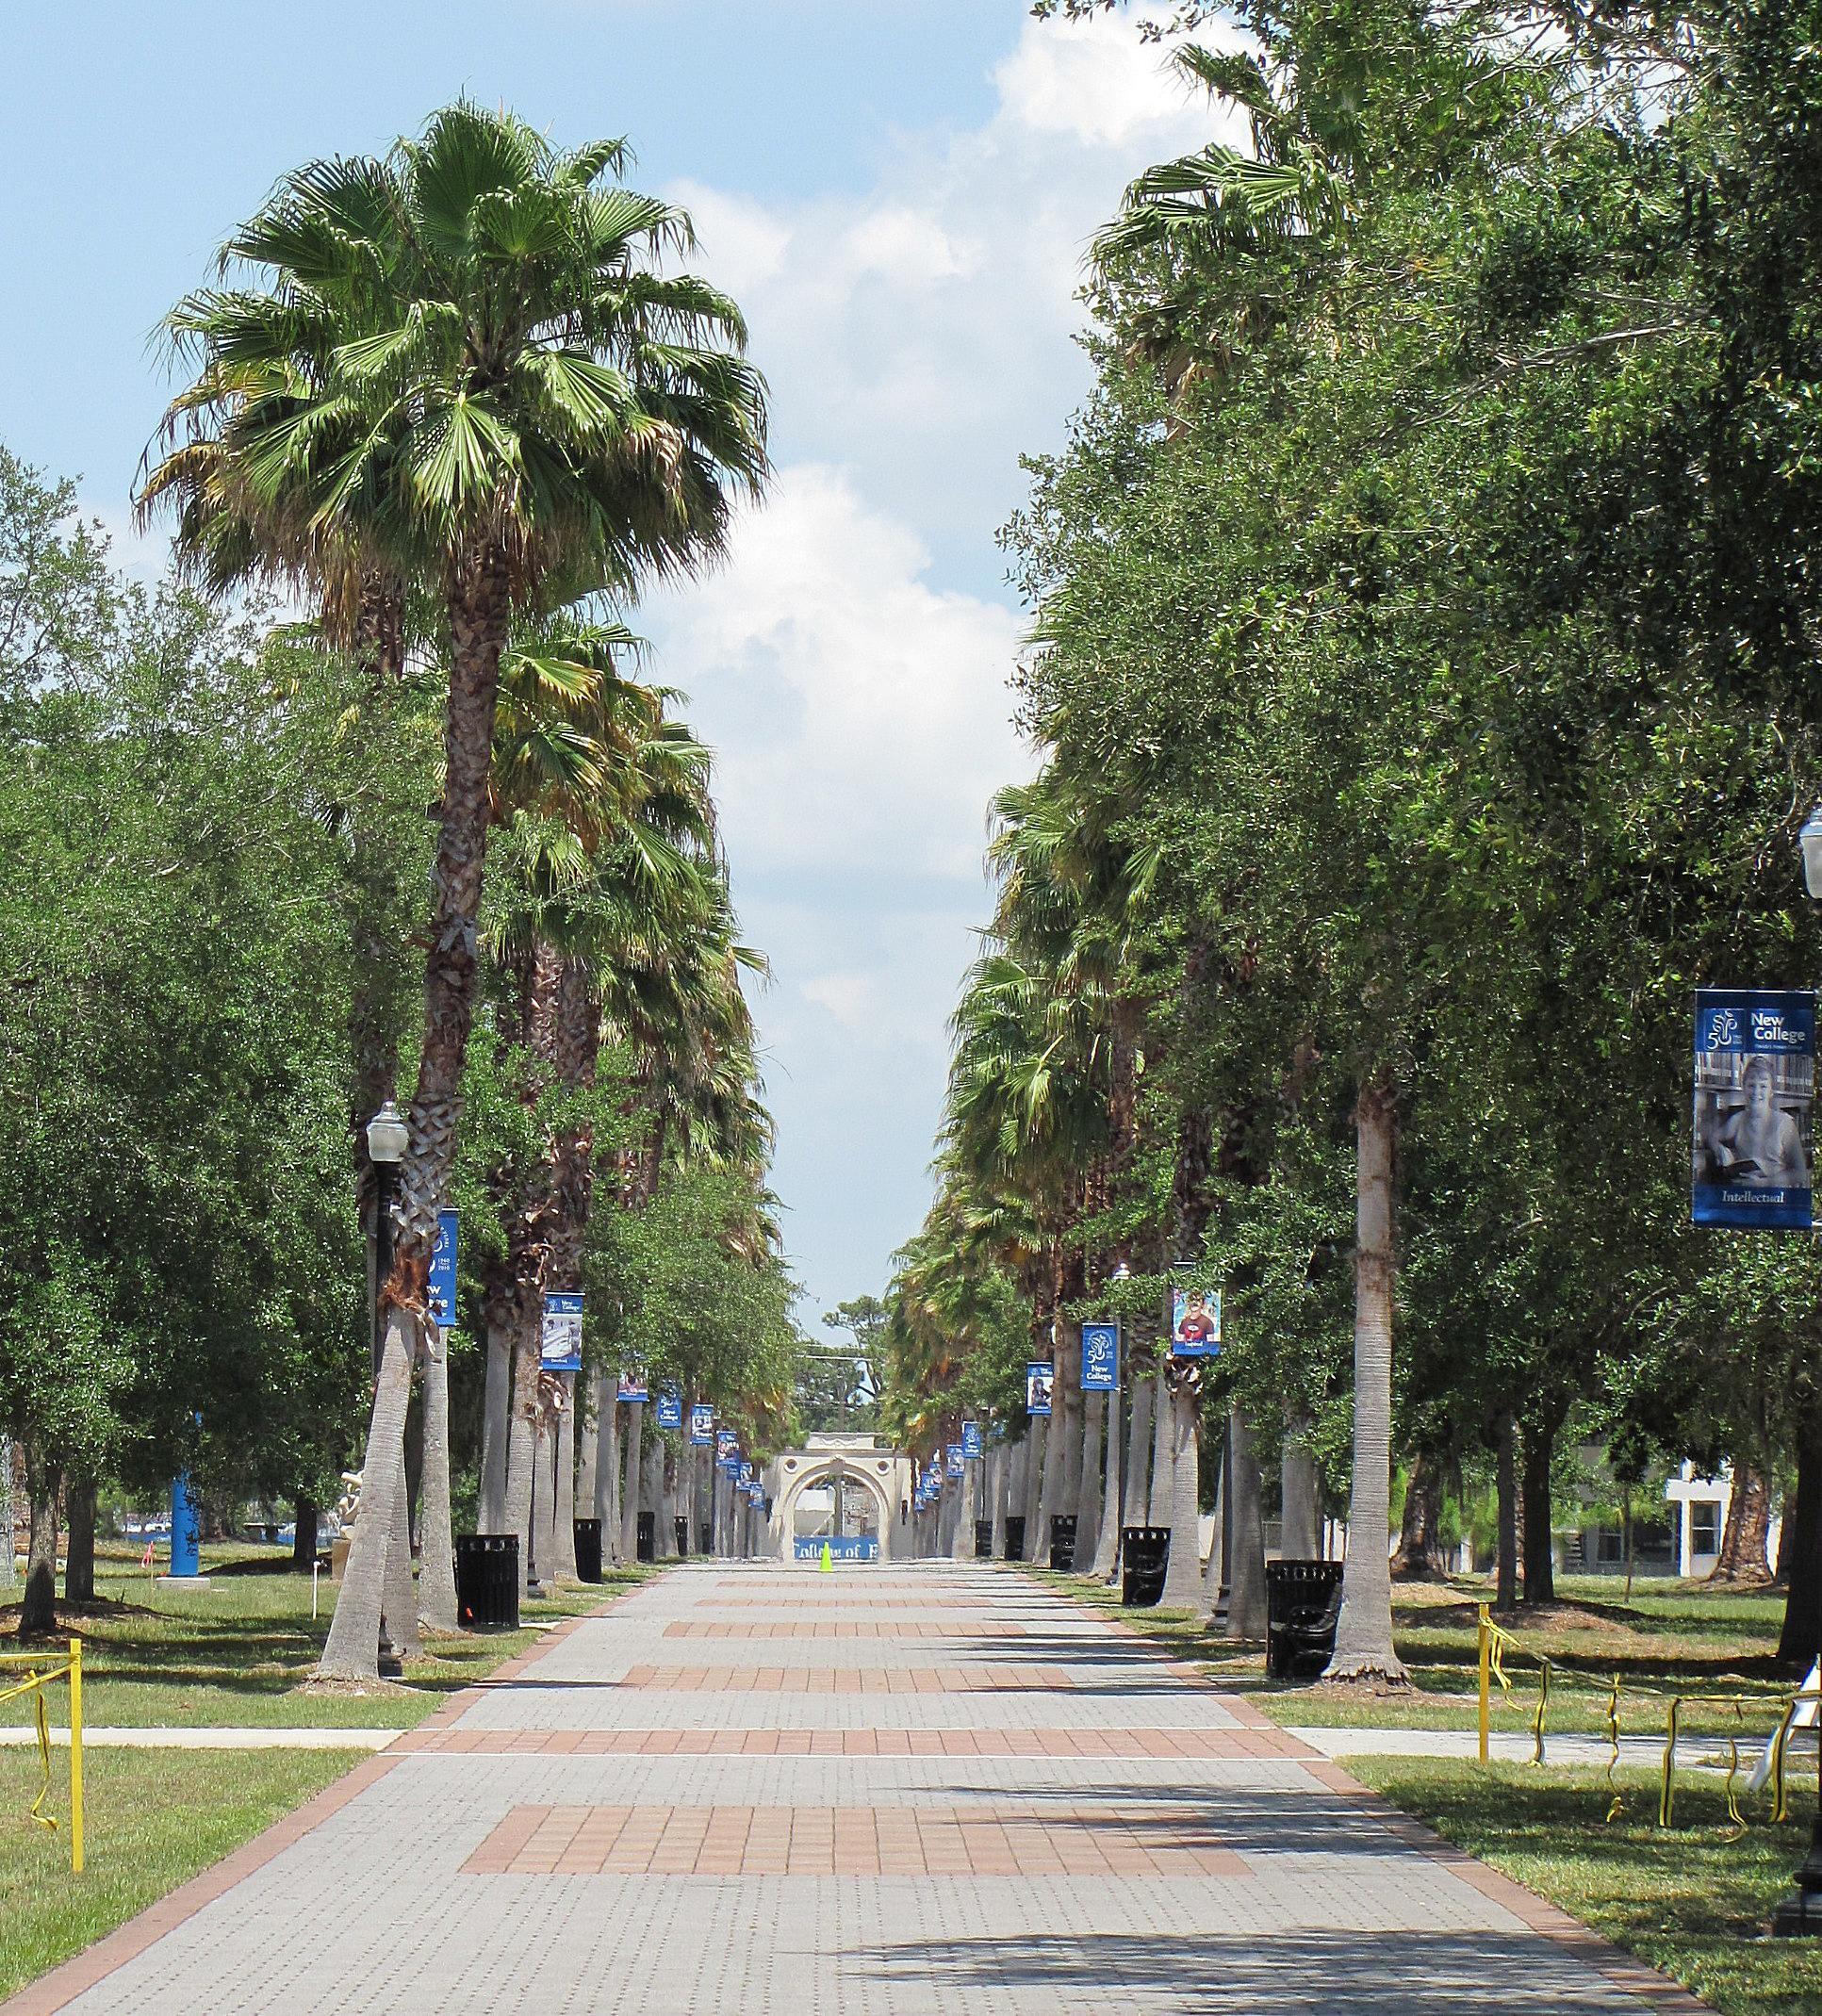 Dort Promenade at New College of Florida